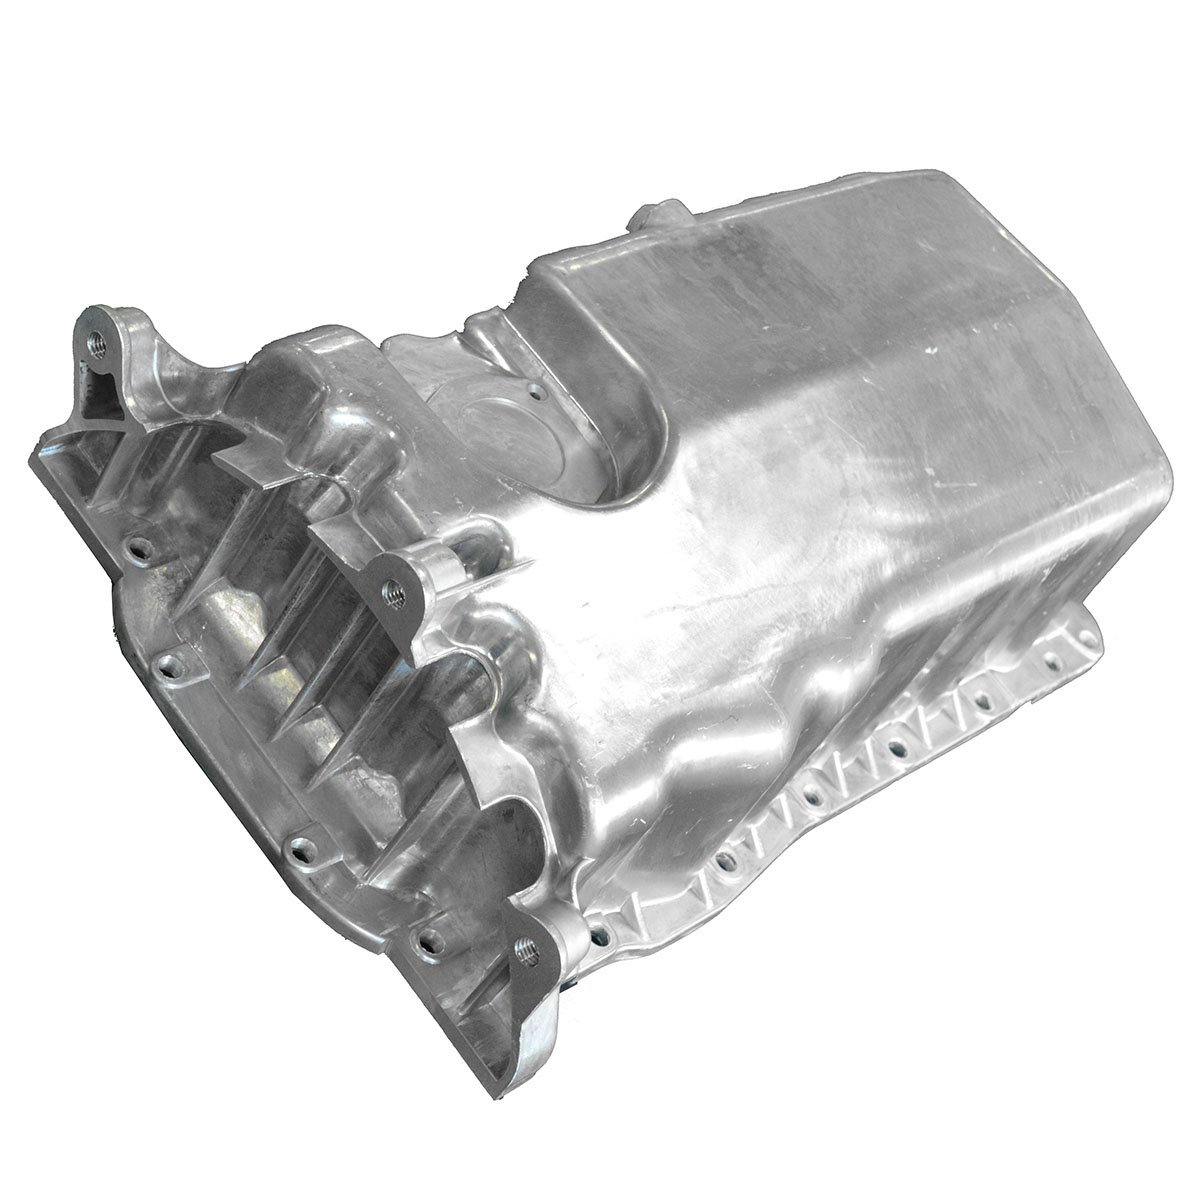 Engine Oil Pan Aluminum for VW Beetle Golf Jetta